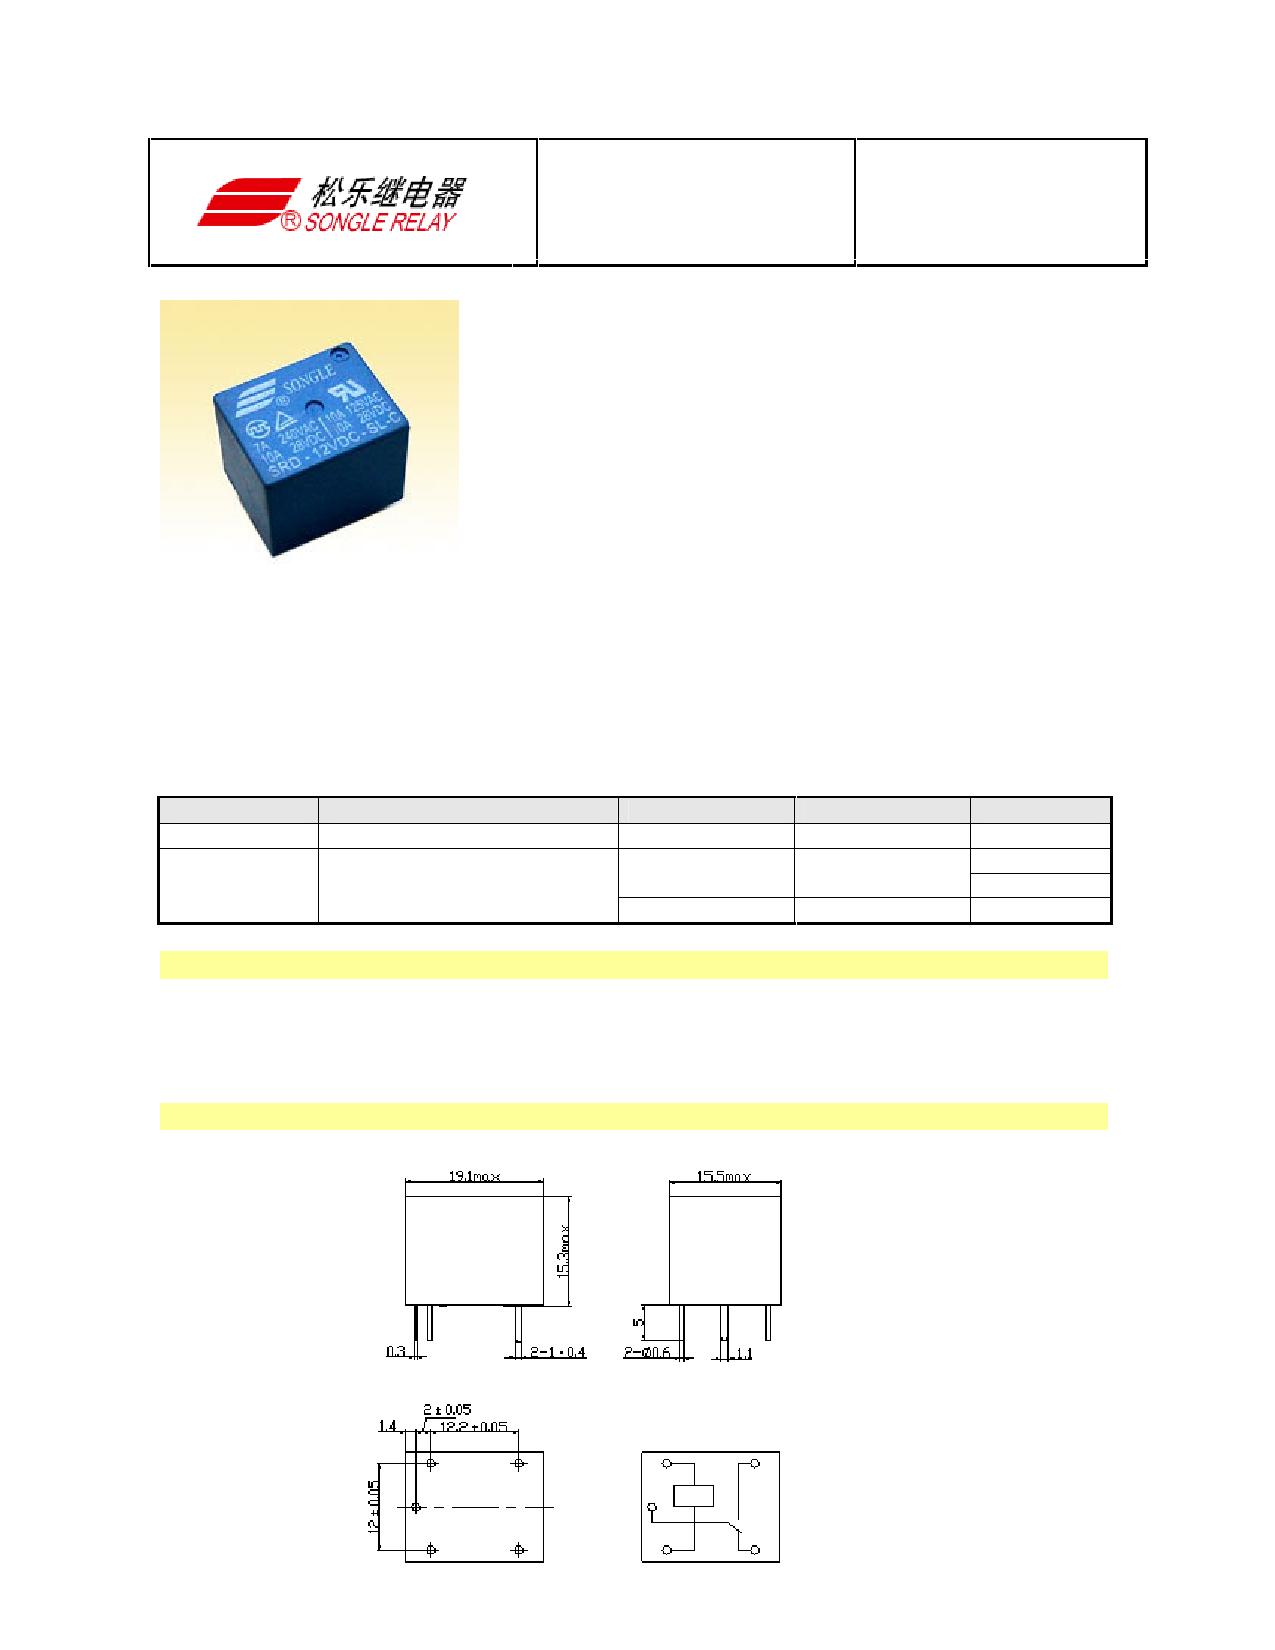 SRD-06VDC-SL-C image